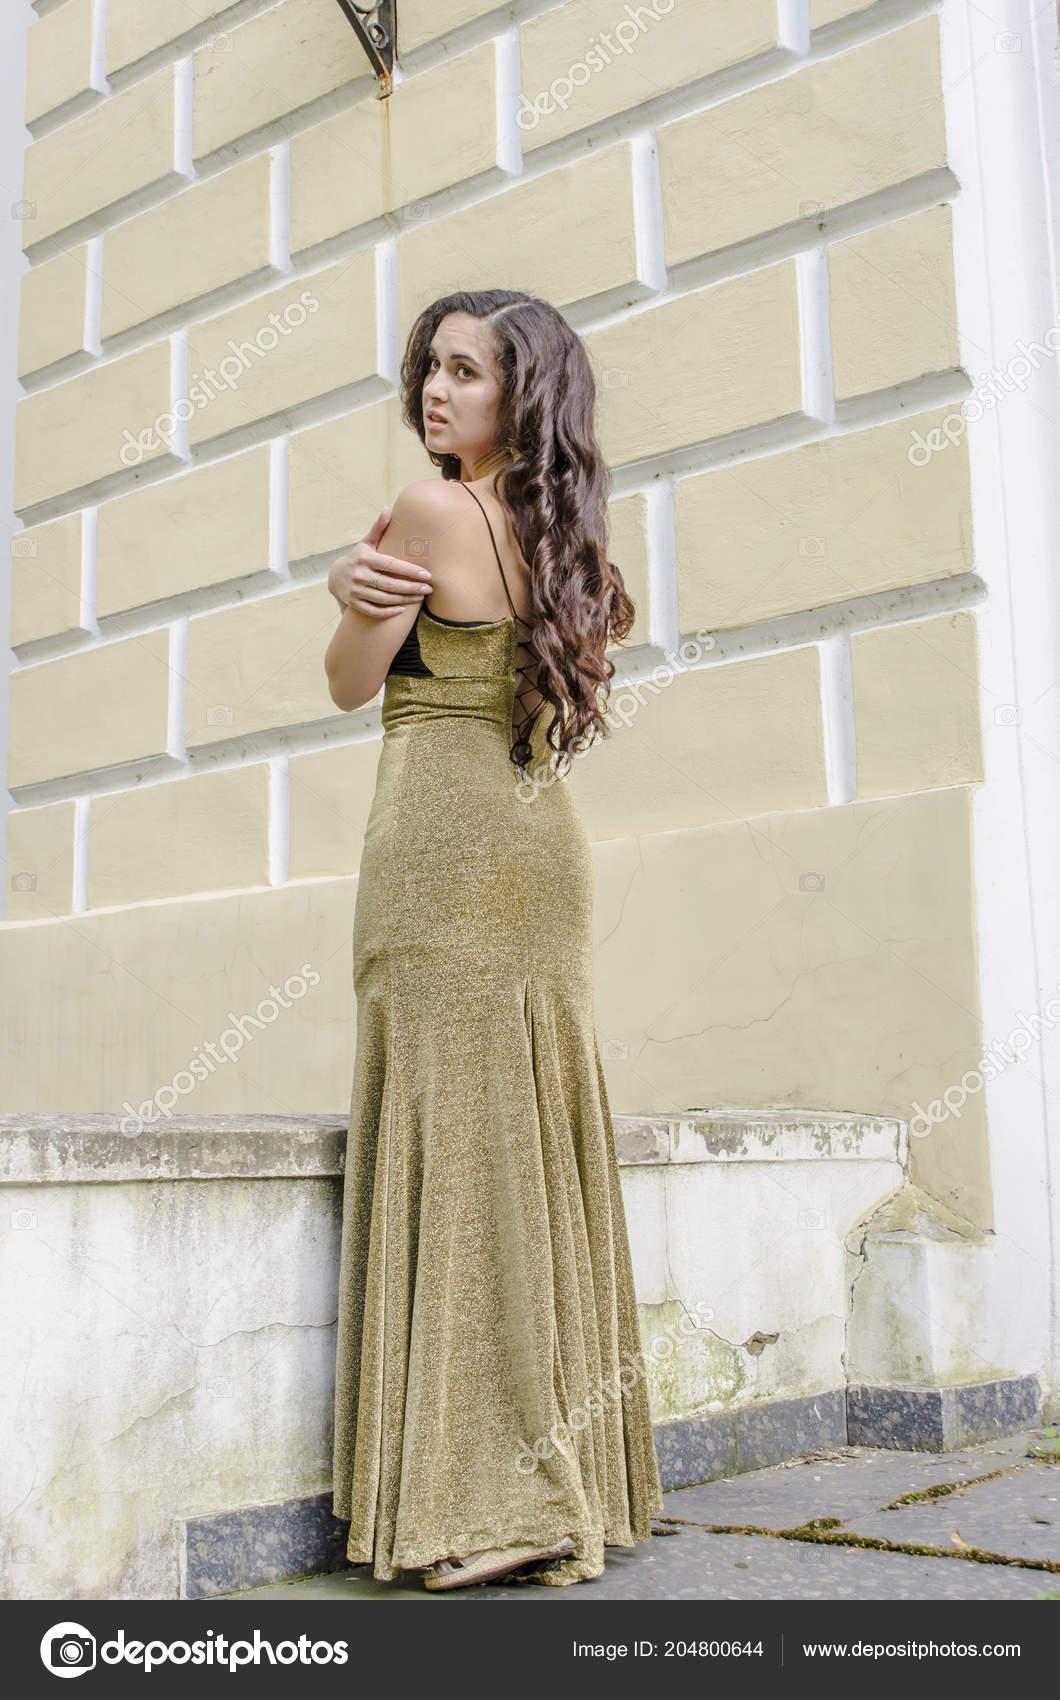 7e1be32658a3 Όμορφη μελαχρινή κοπέλα σε ένα μακρύ φόρεμα δεξίωσης από το μπαλκόνι του  παλιού σπιτιού — Εικόνα από ...